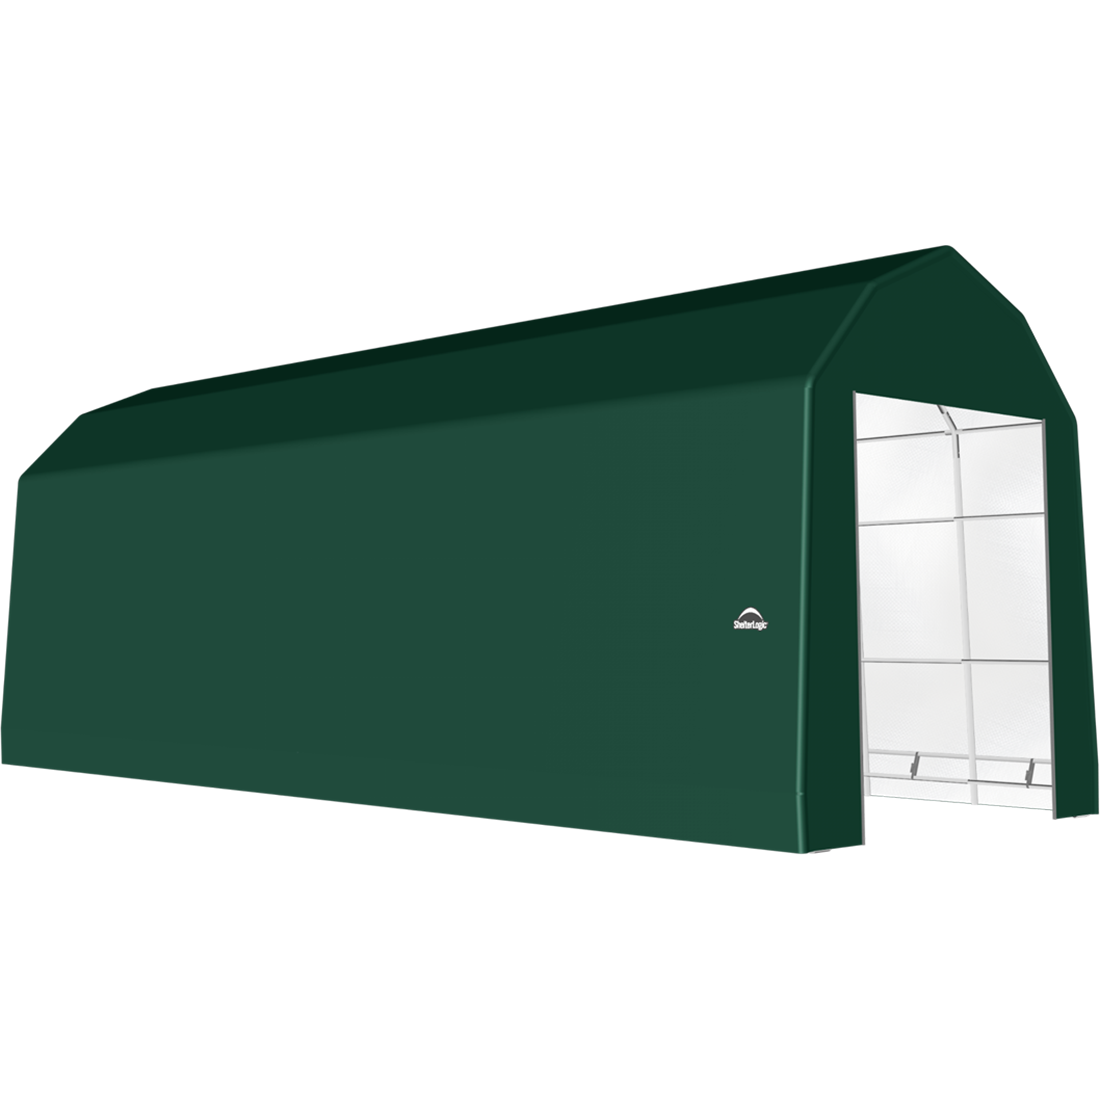 SP Barn 15X40X17 Green 14 oz PE Shelter